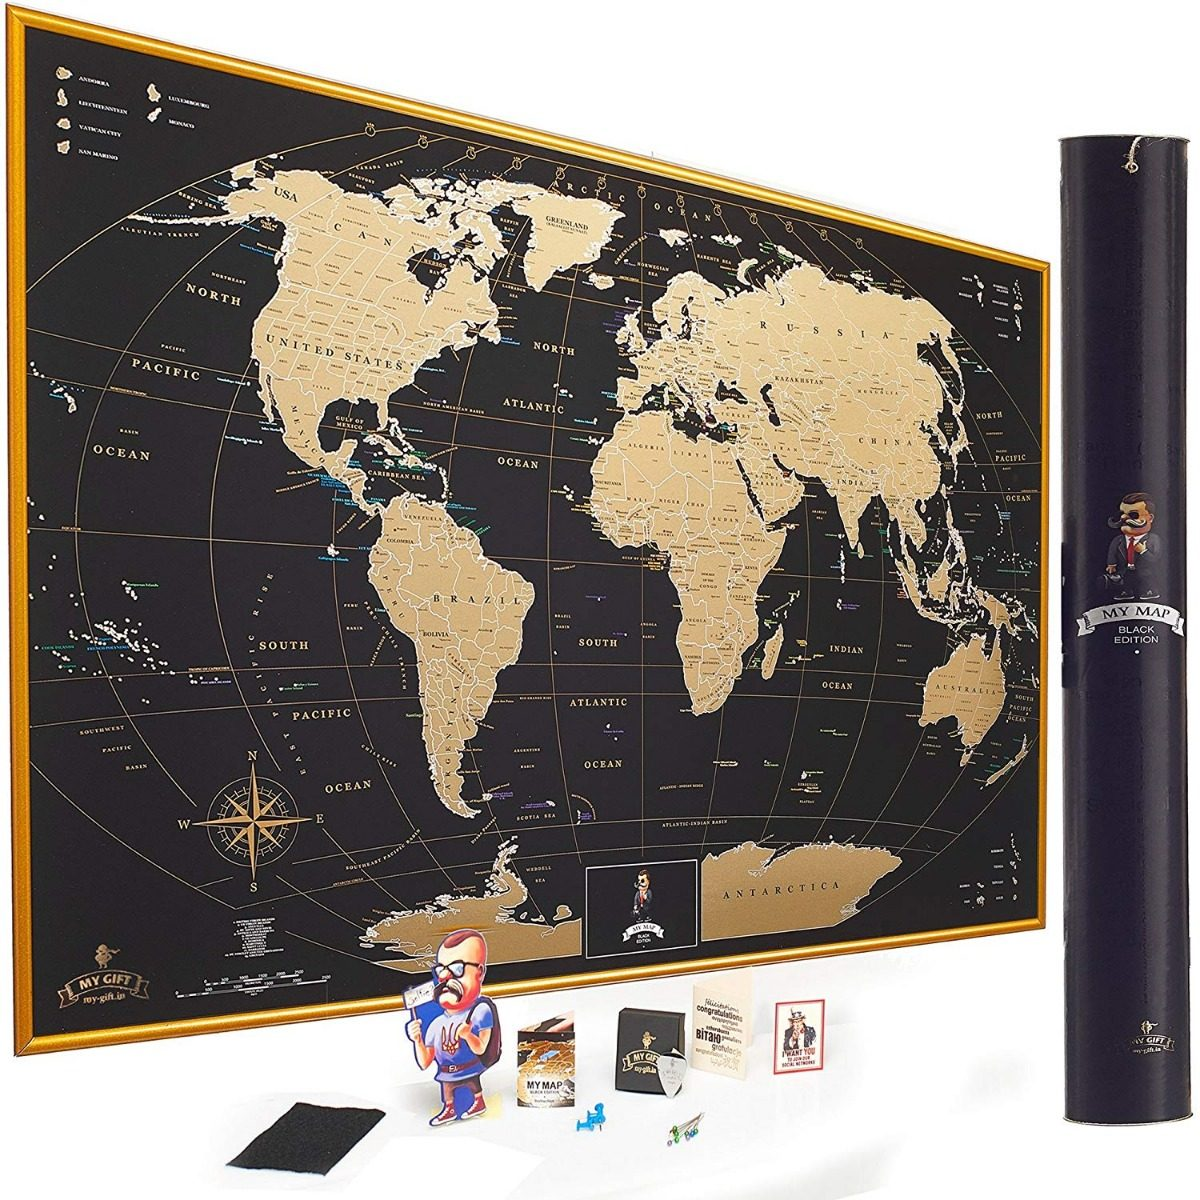 Mapa Rascable Del Mundo Gigante Accesorios 81 X 63 Cm